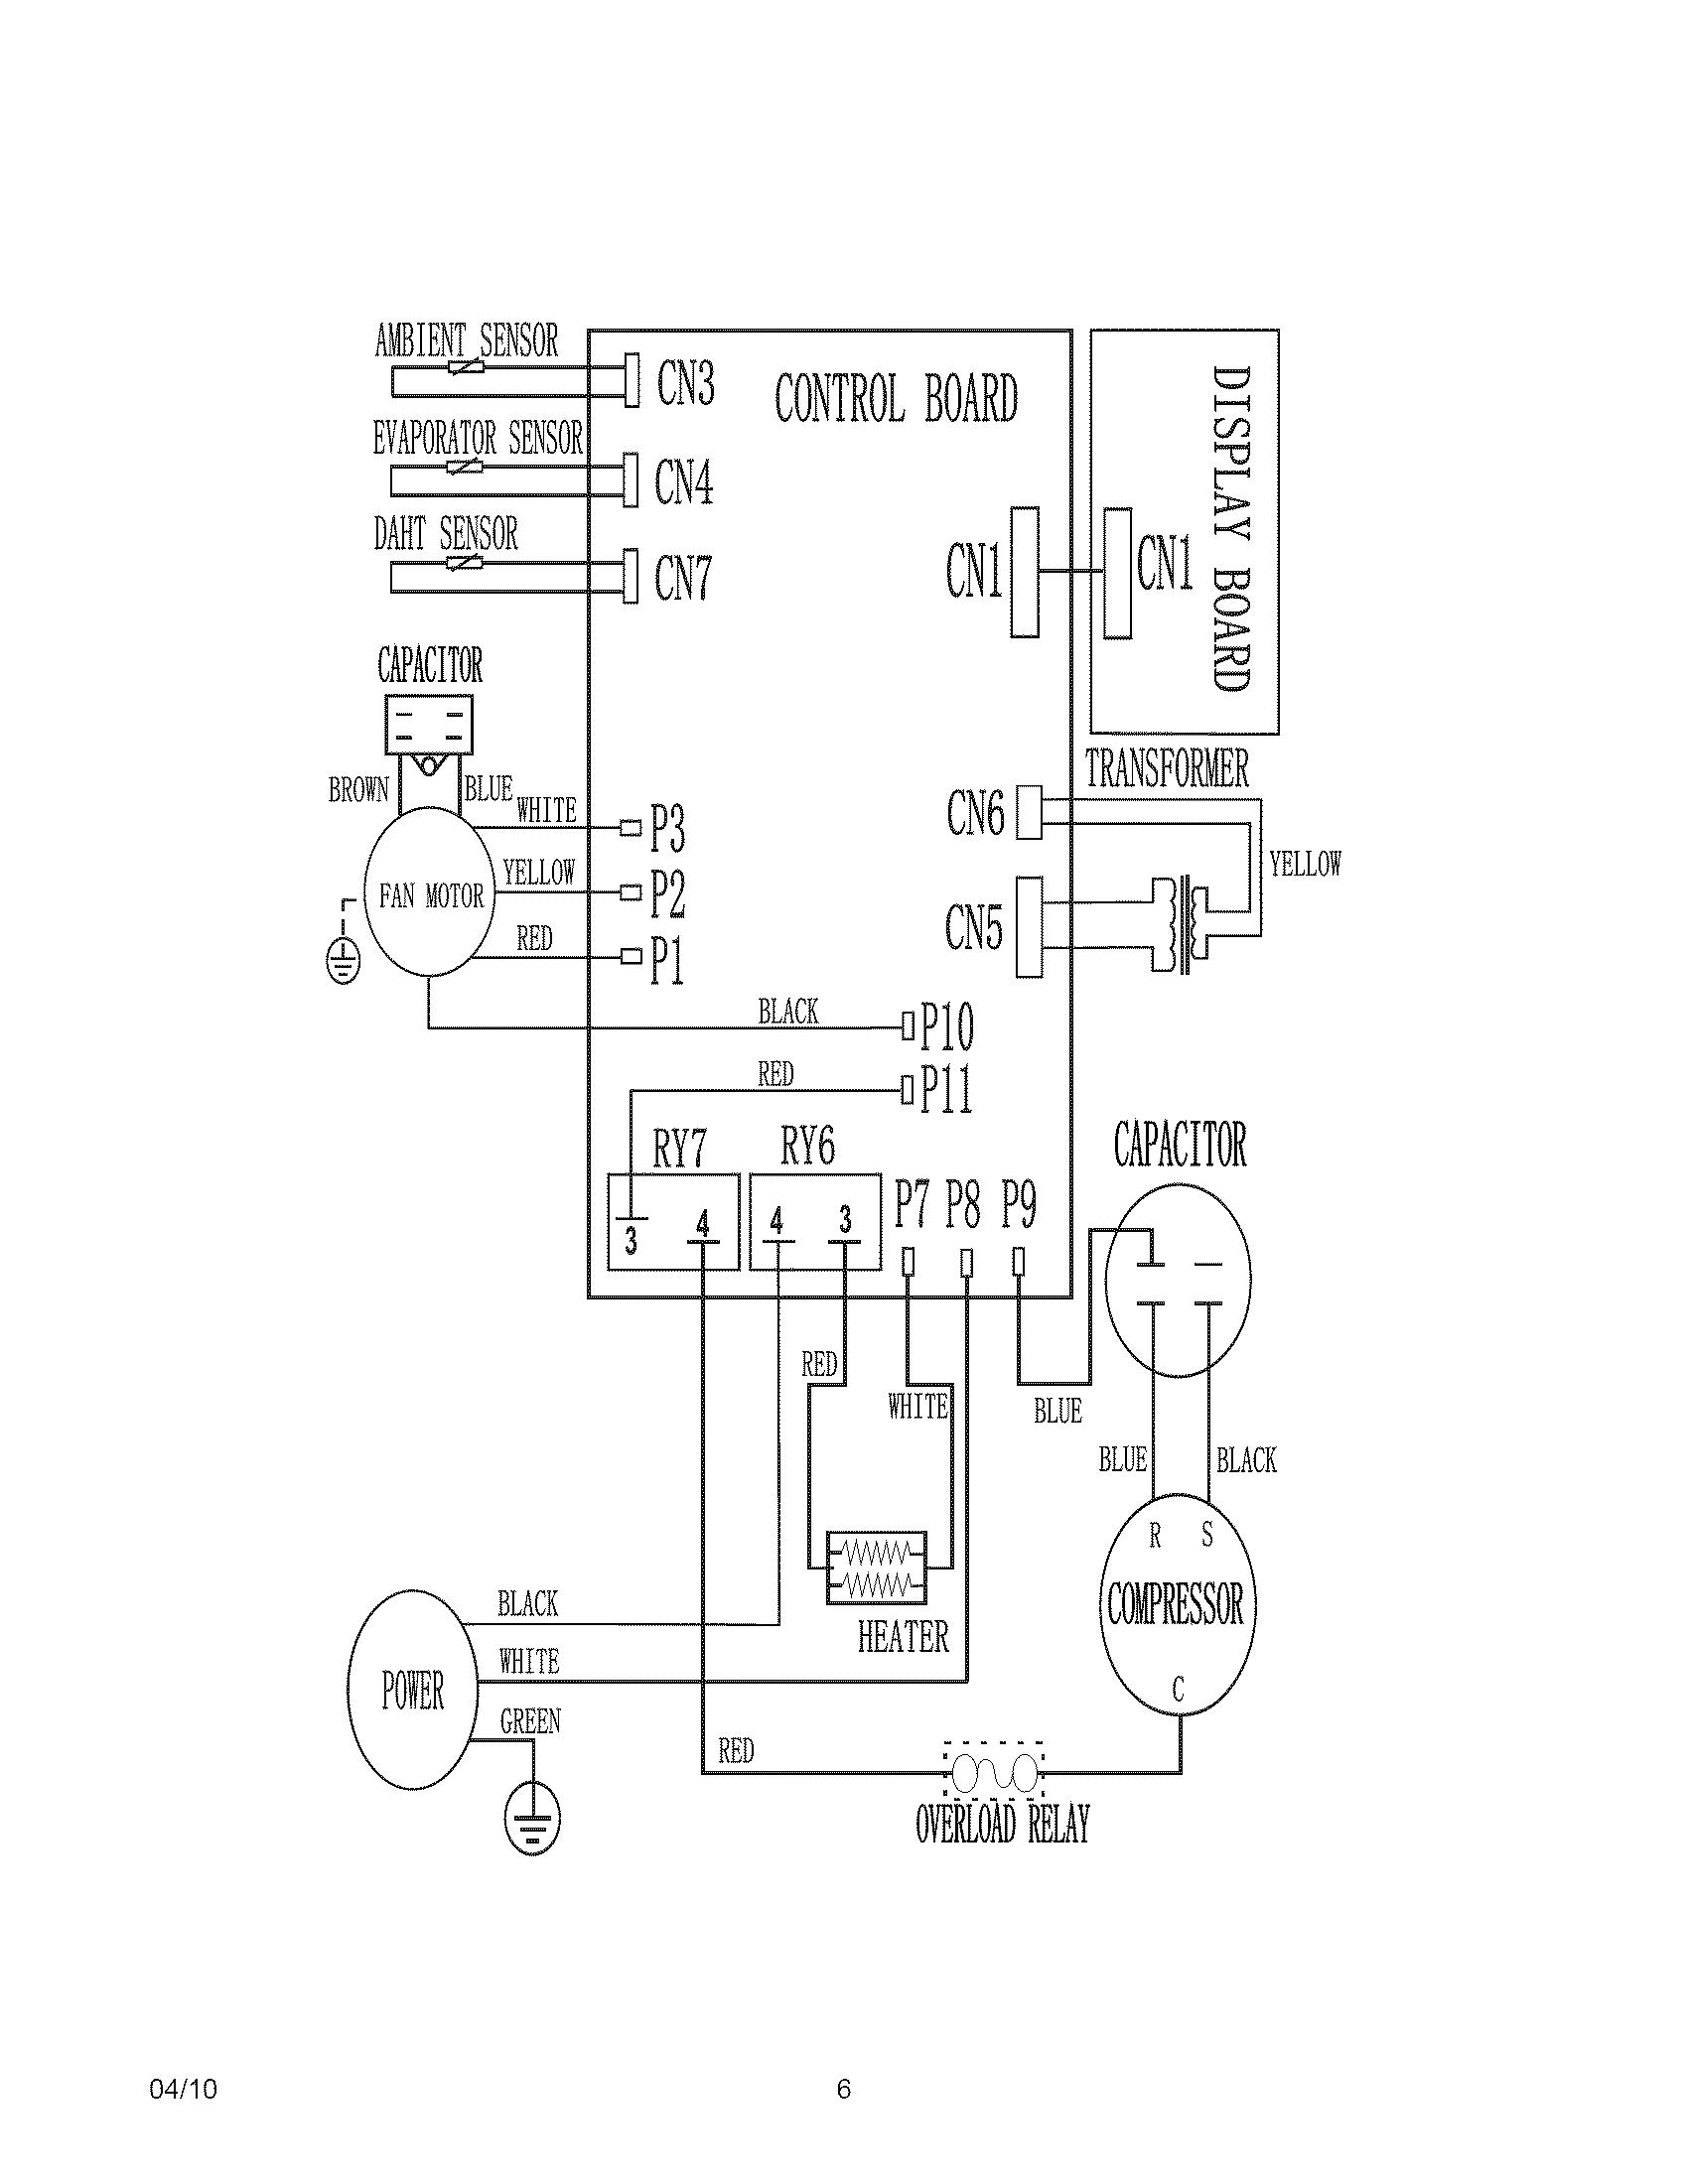 Heat Pump Parts Diagram trane xl 90 parts diagrams trane xe1000 diagram • apoint.co